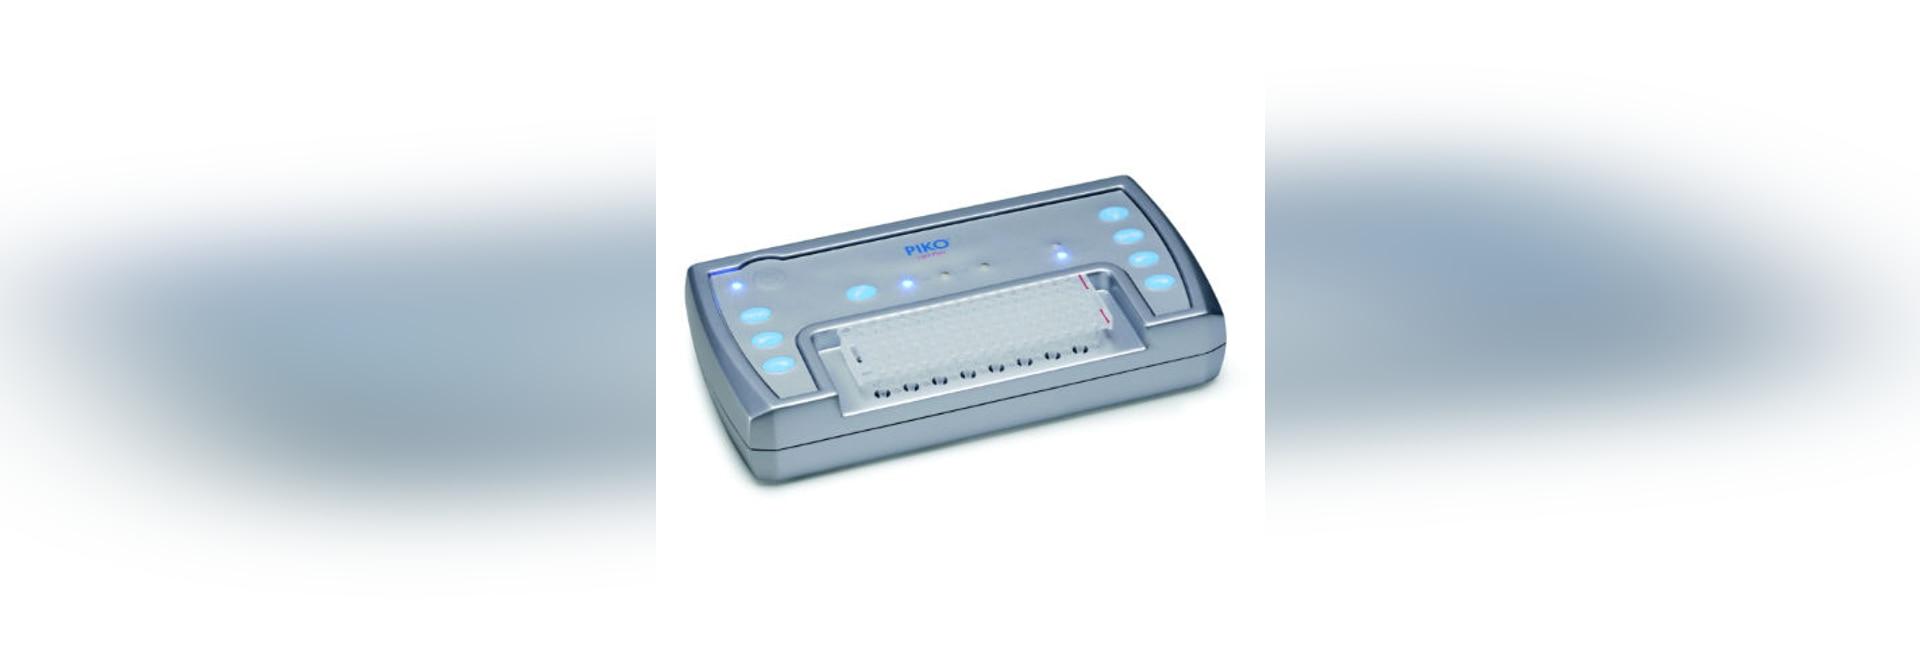 NEW: LED illuminator by Thermo Scientific - Laboratory Equipment